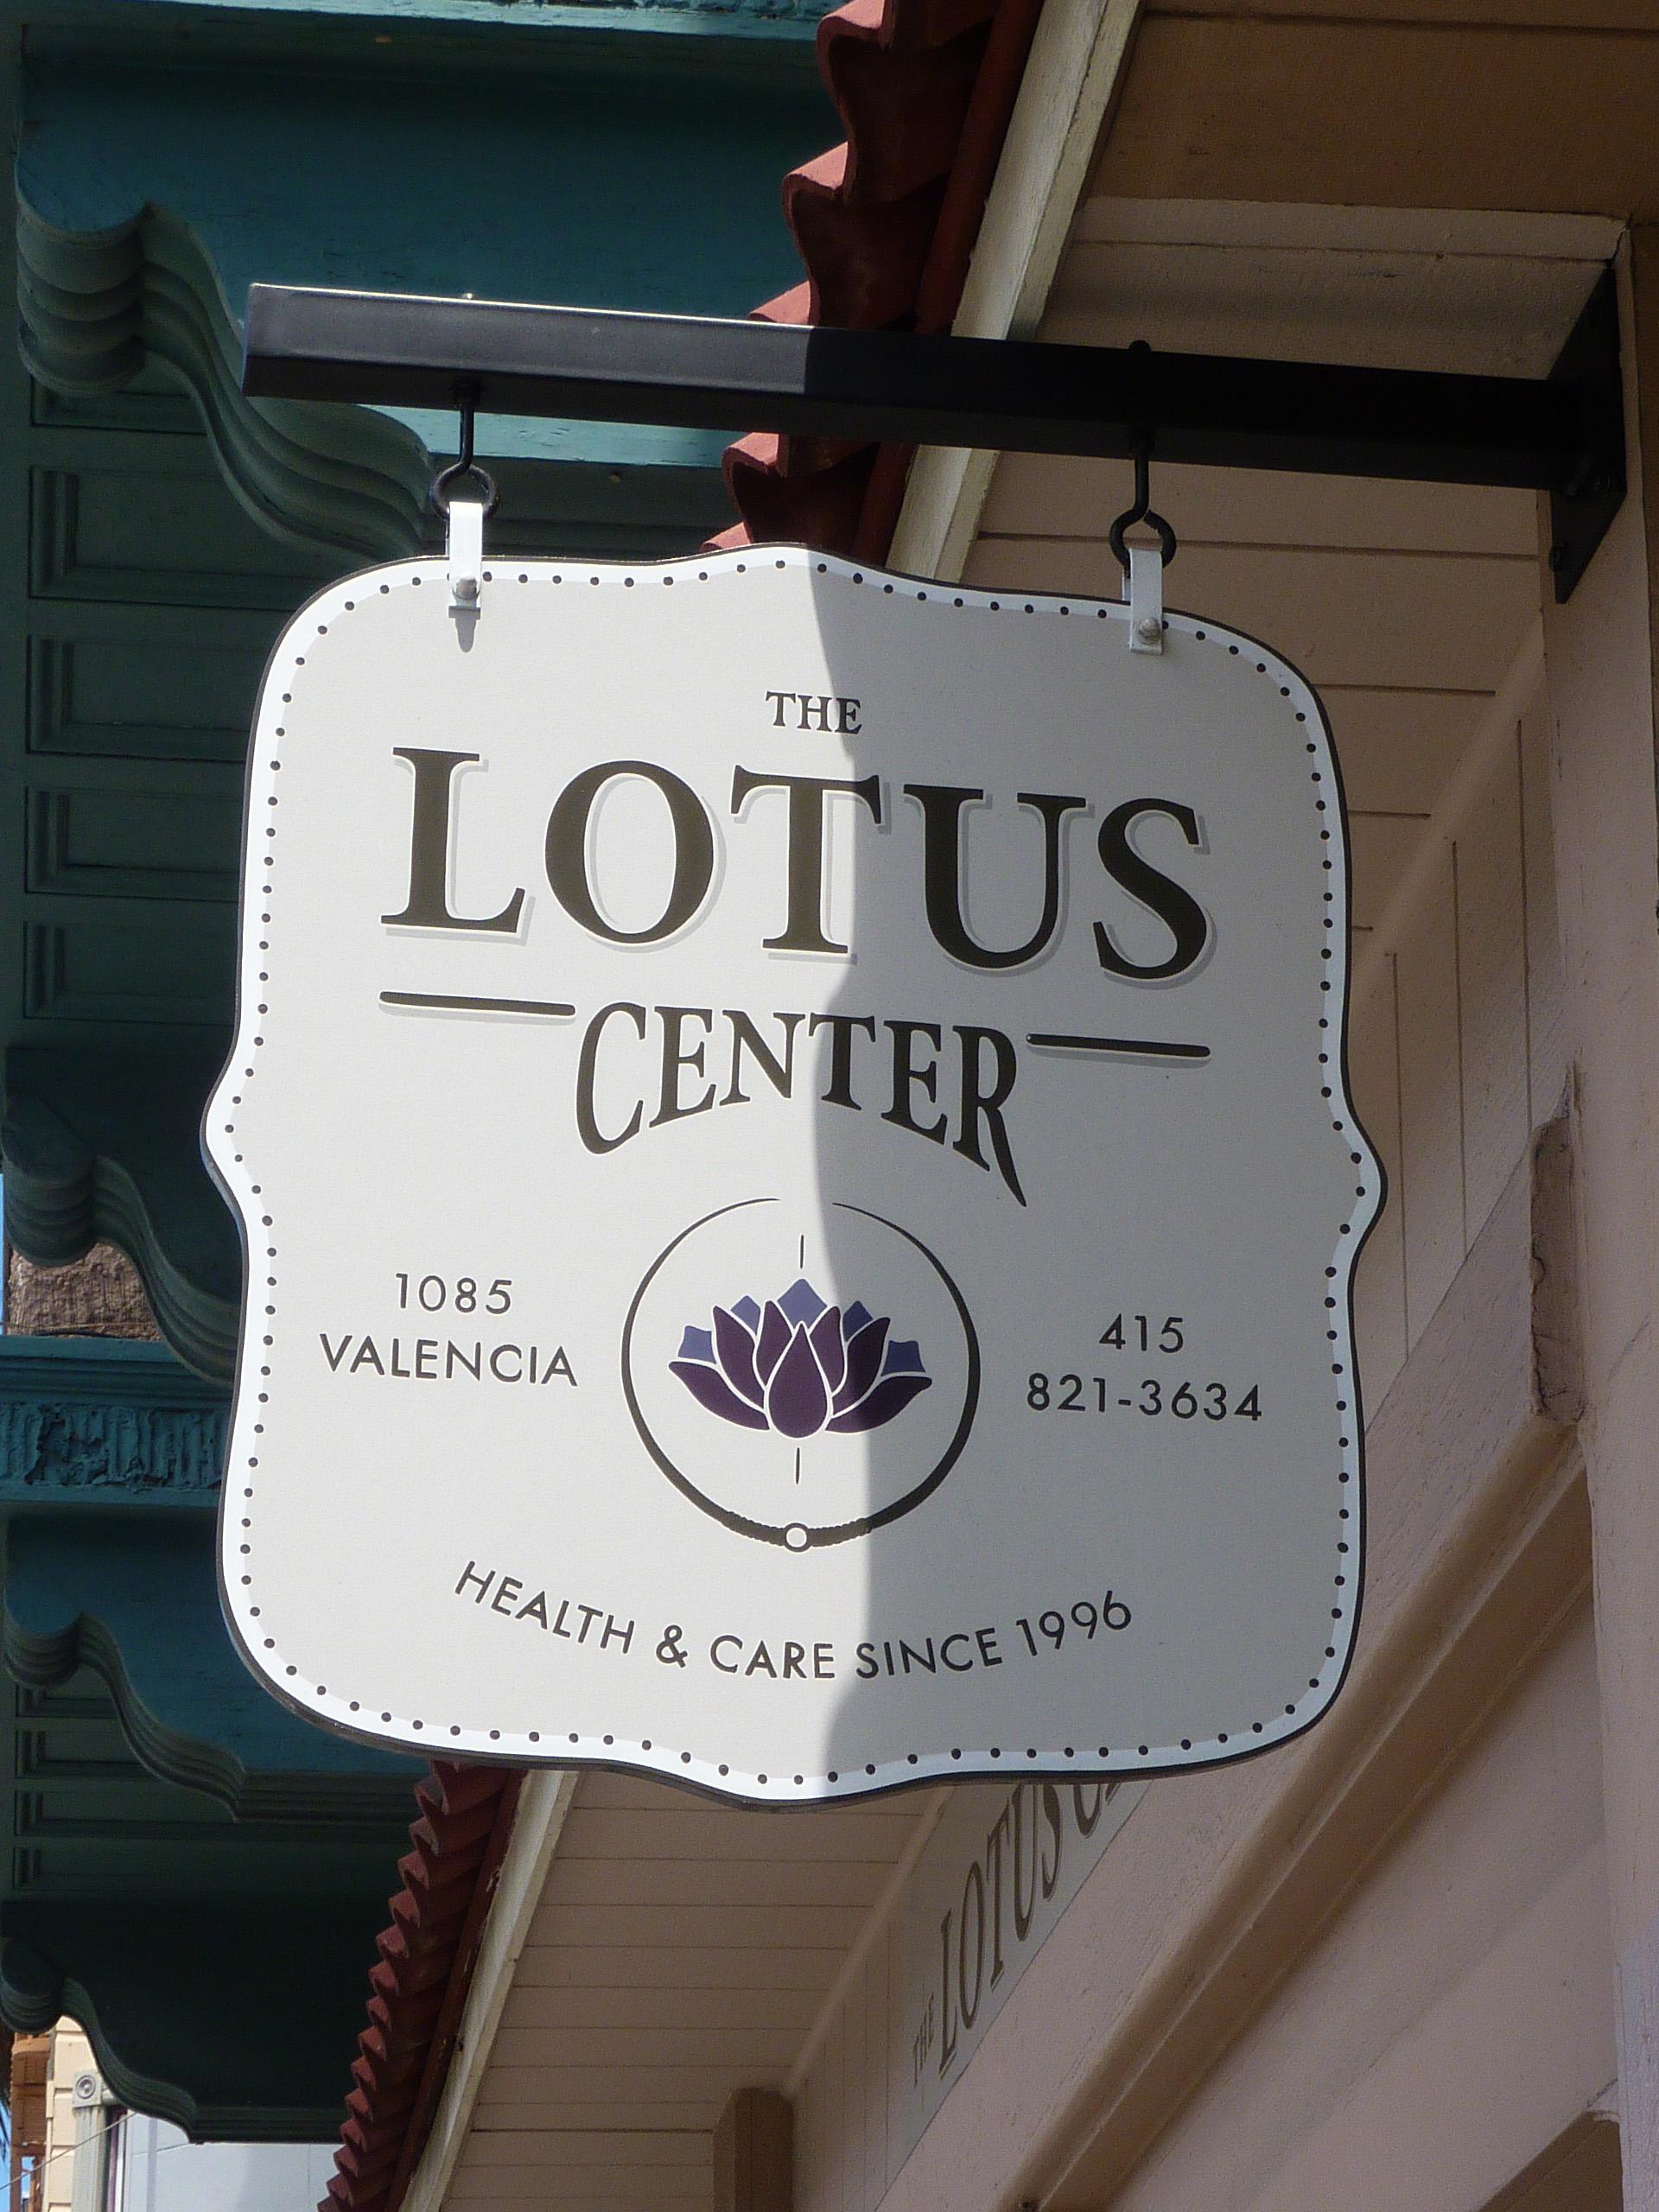 HAND-lotus-center_6057426830_o.jpg